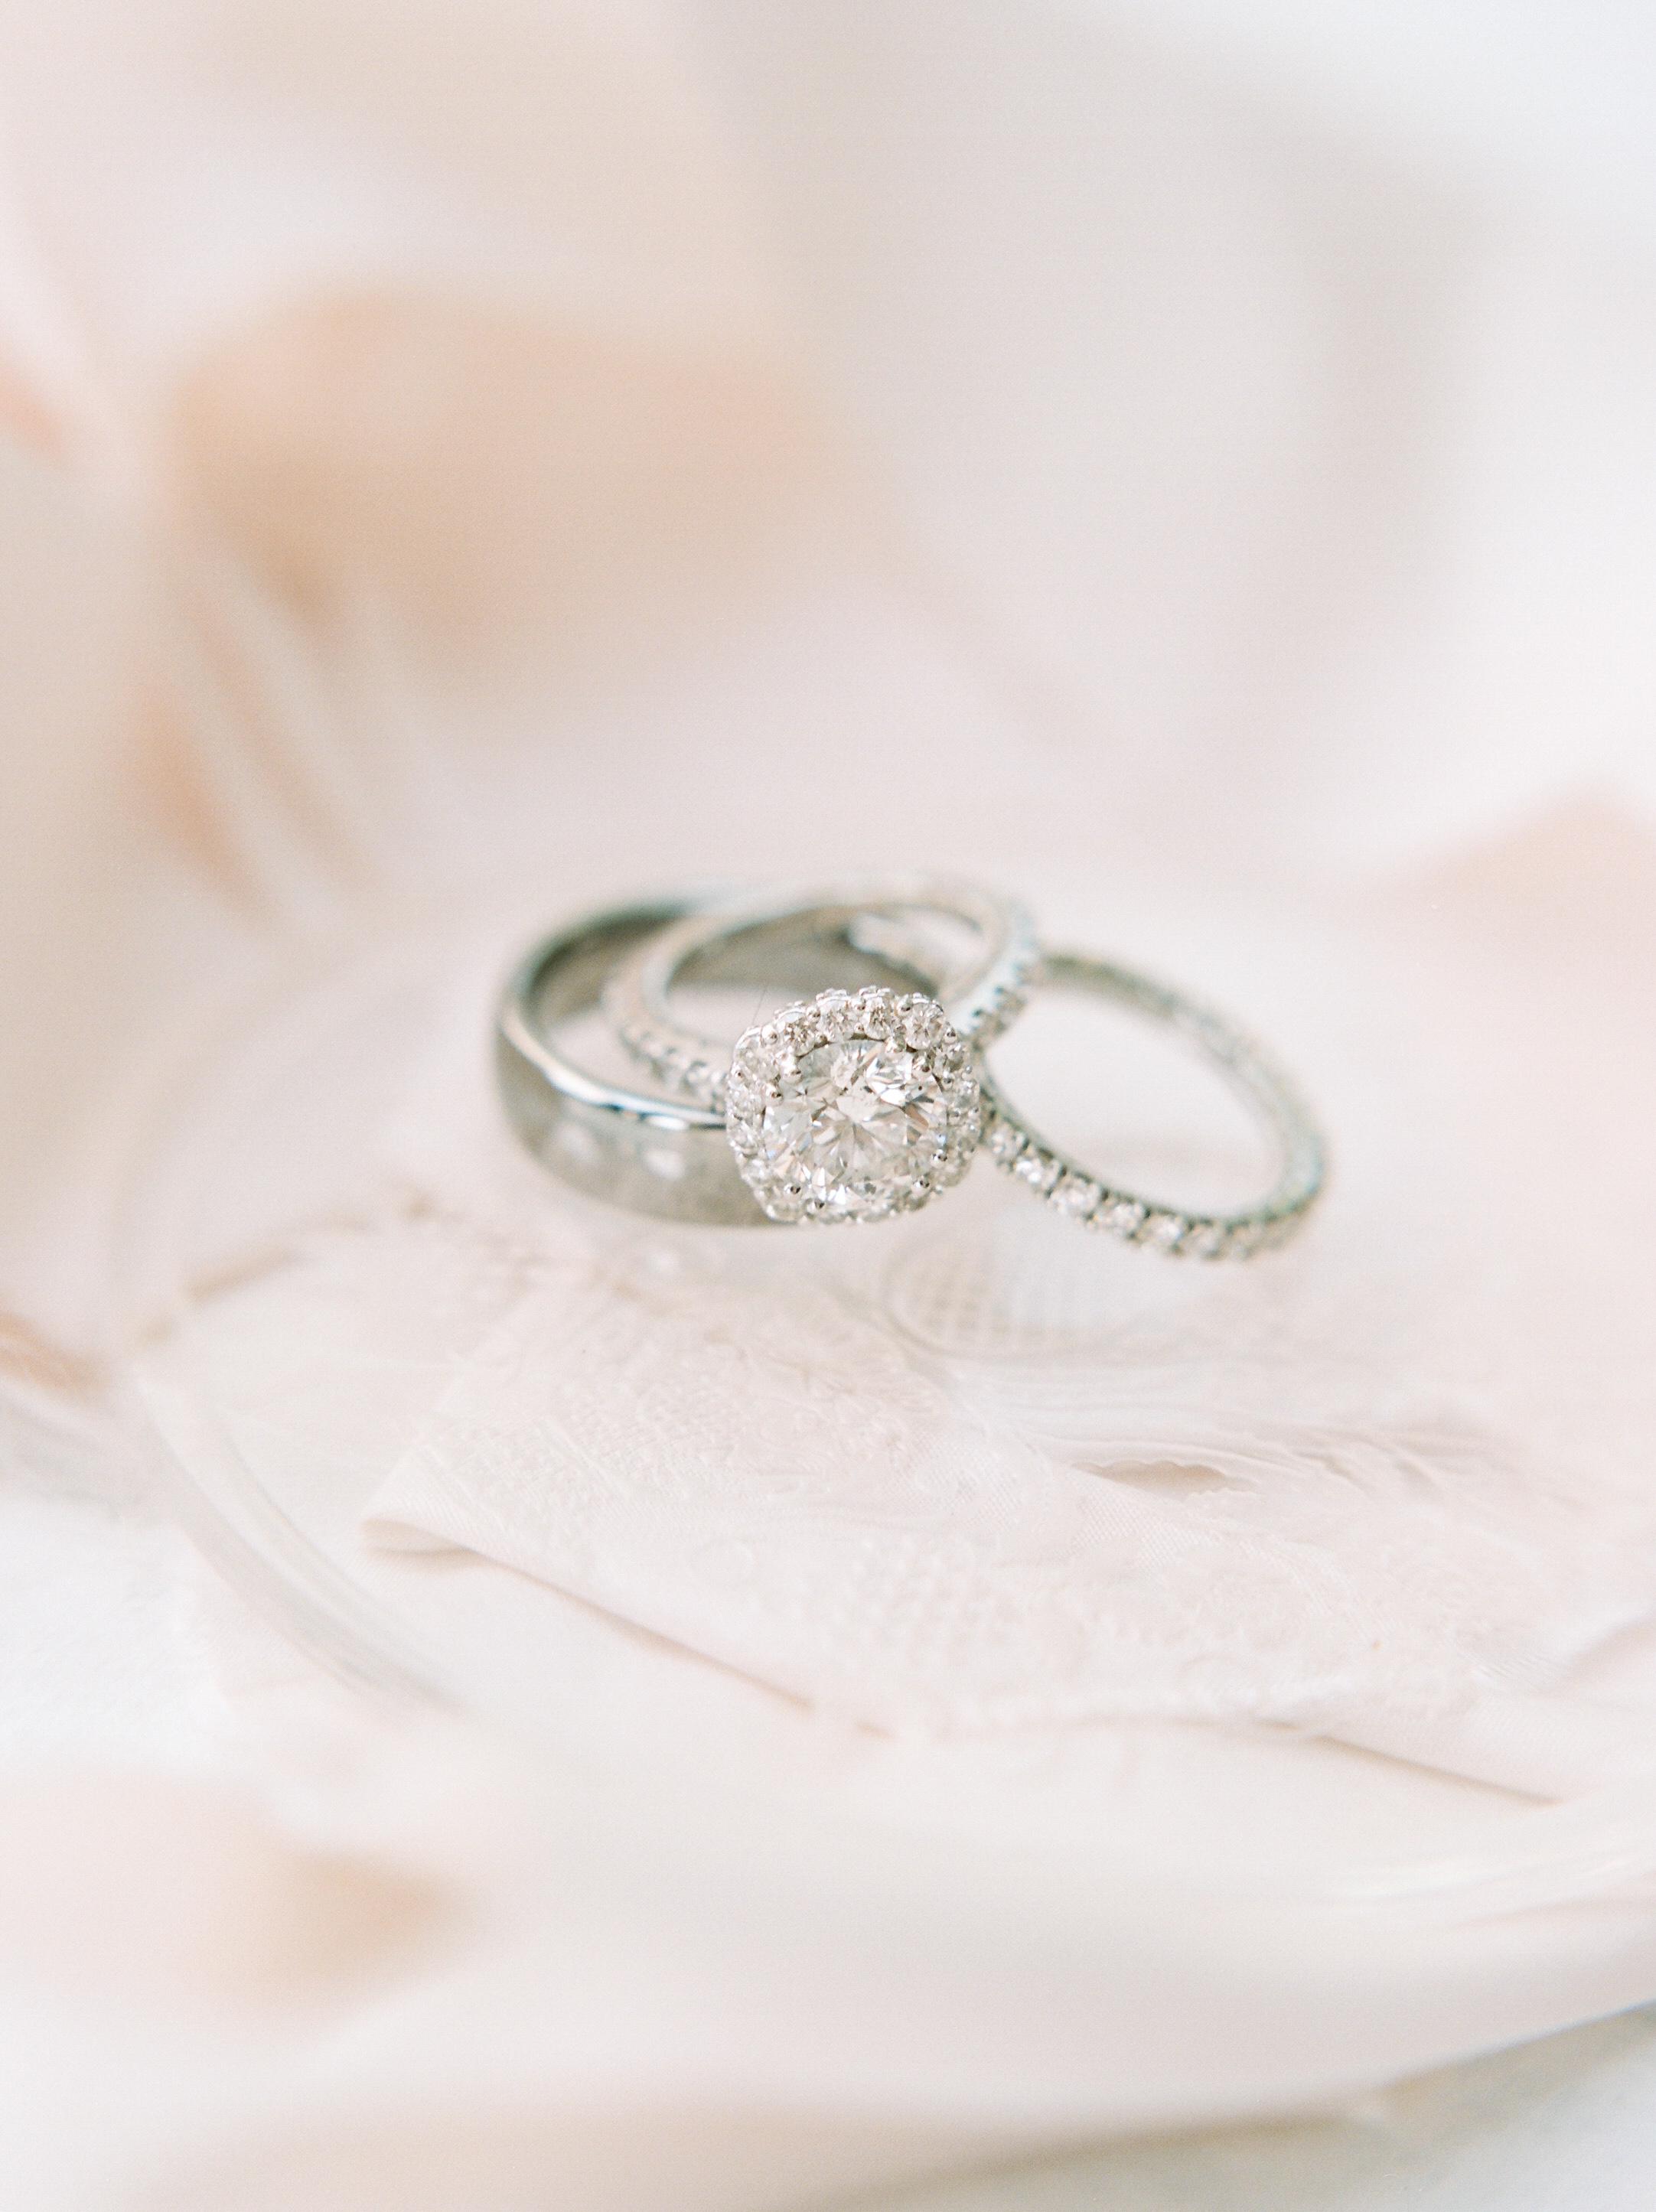 Martha-Stewart-Wedding-Dana-Fernandez-Photography-Josh-Texas-Film-Houston-Wedding-Fine-Art-Photographer-McGovern-Centennial-Gardens-Top-Best-145.jpg